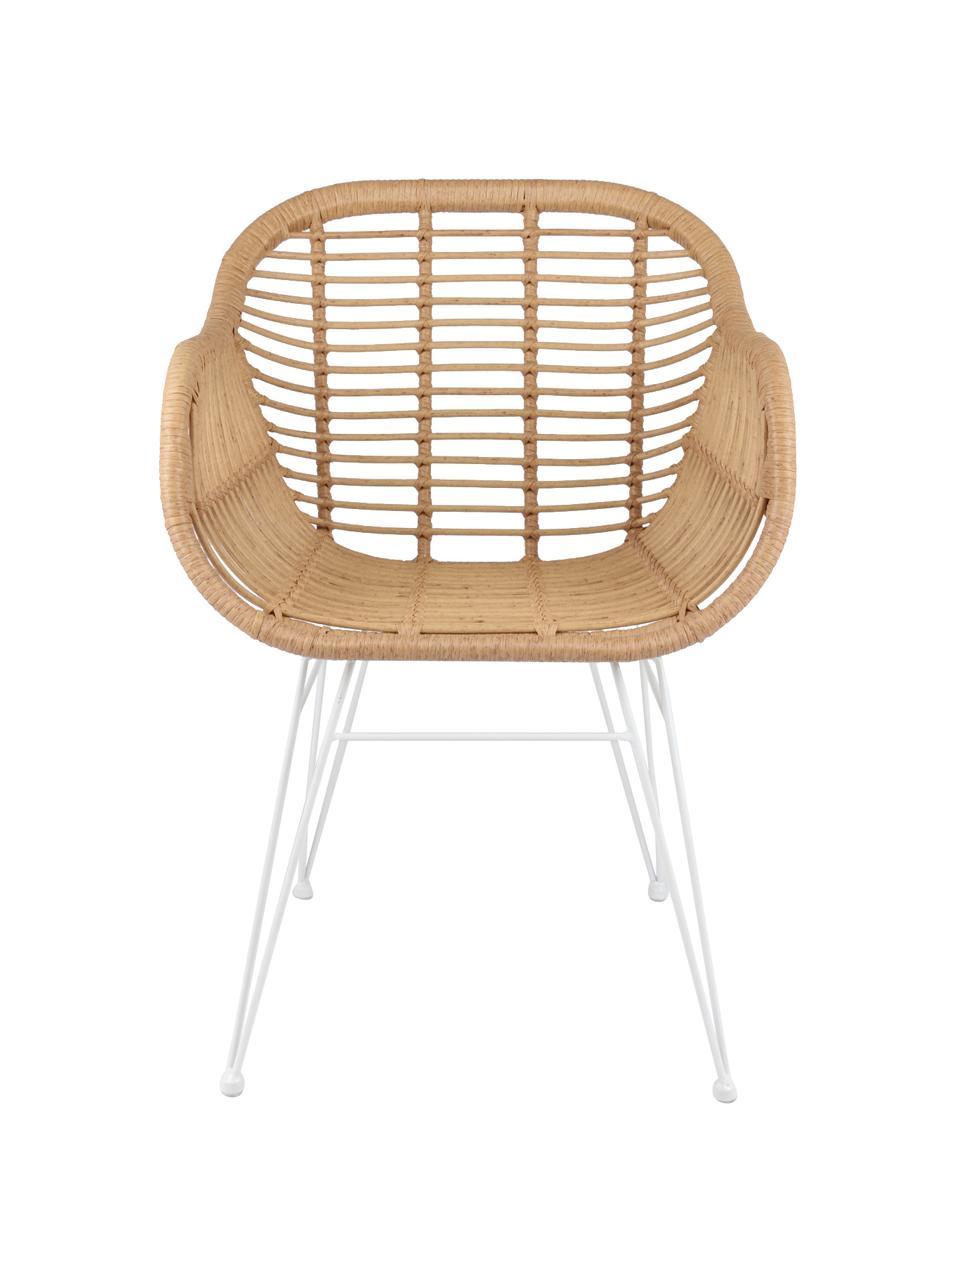 Polyrattan-Armlehnstühle Costa, 2 Stück, Sitzfläche: Polyethylen-Geflecht, Gestell: Metall, pulverbeschichtet, Hellbraun, Weiß, B 59 x T 58 cm